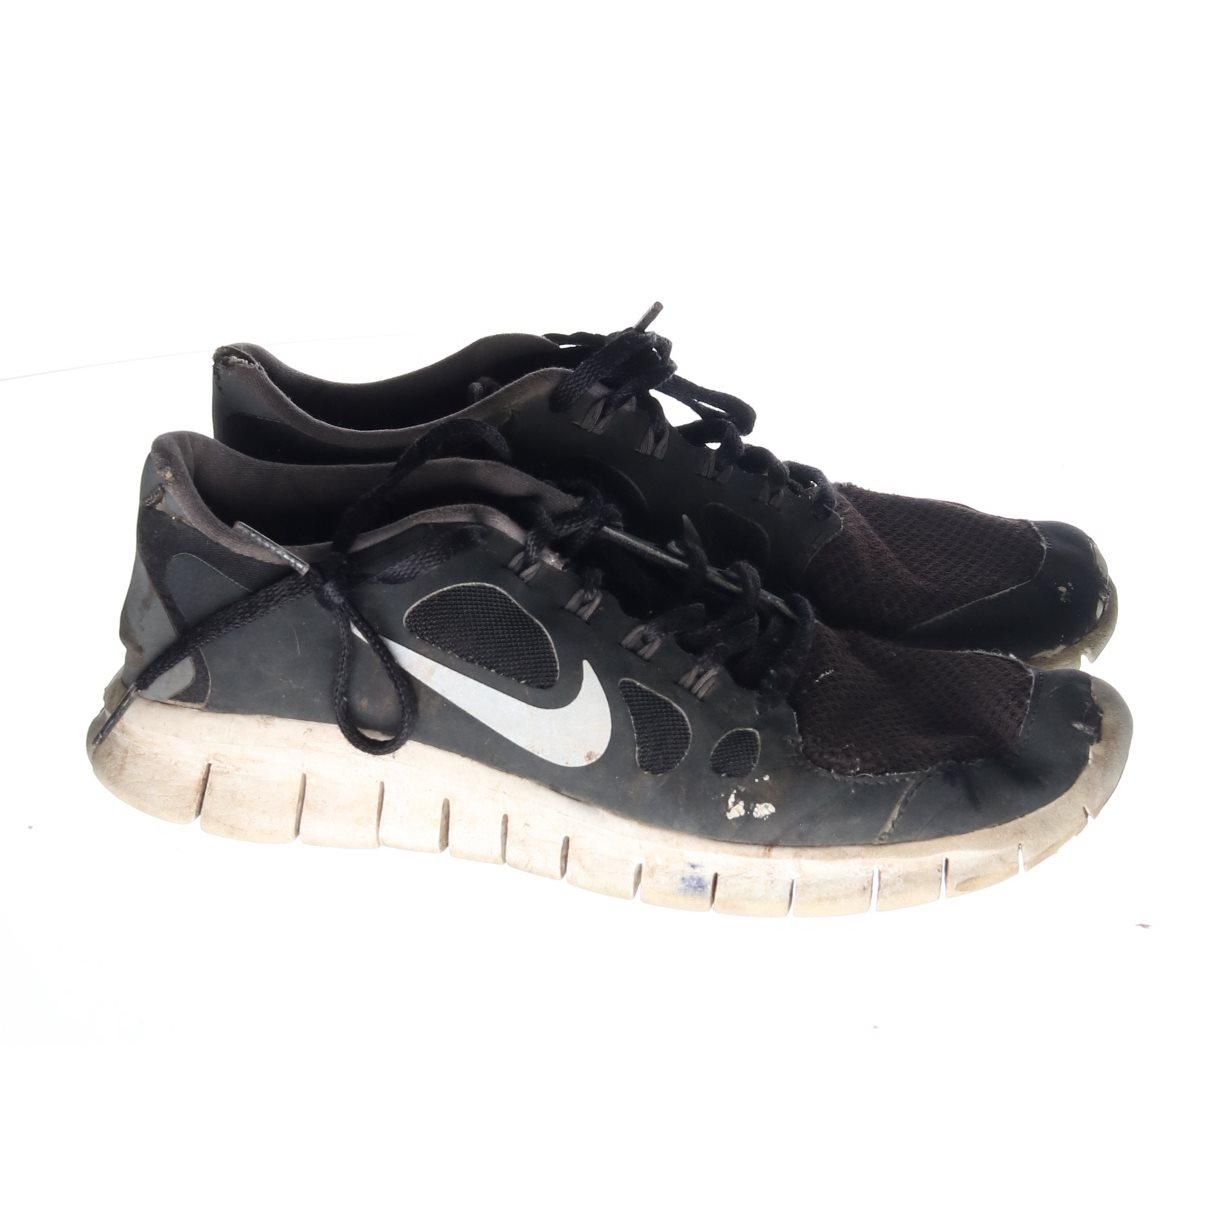 half off 93bb4 e3460 ... reduced nike sneakers strl 385 nike free 5.0 svart 801a0 63143